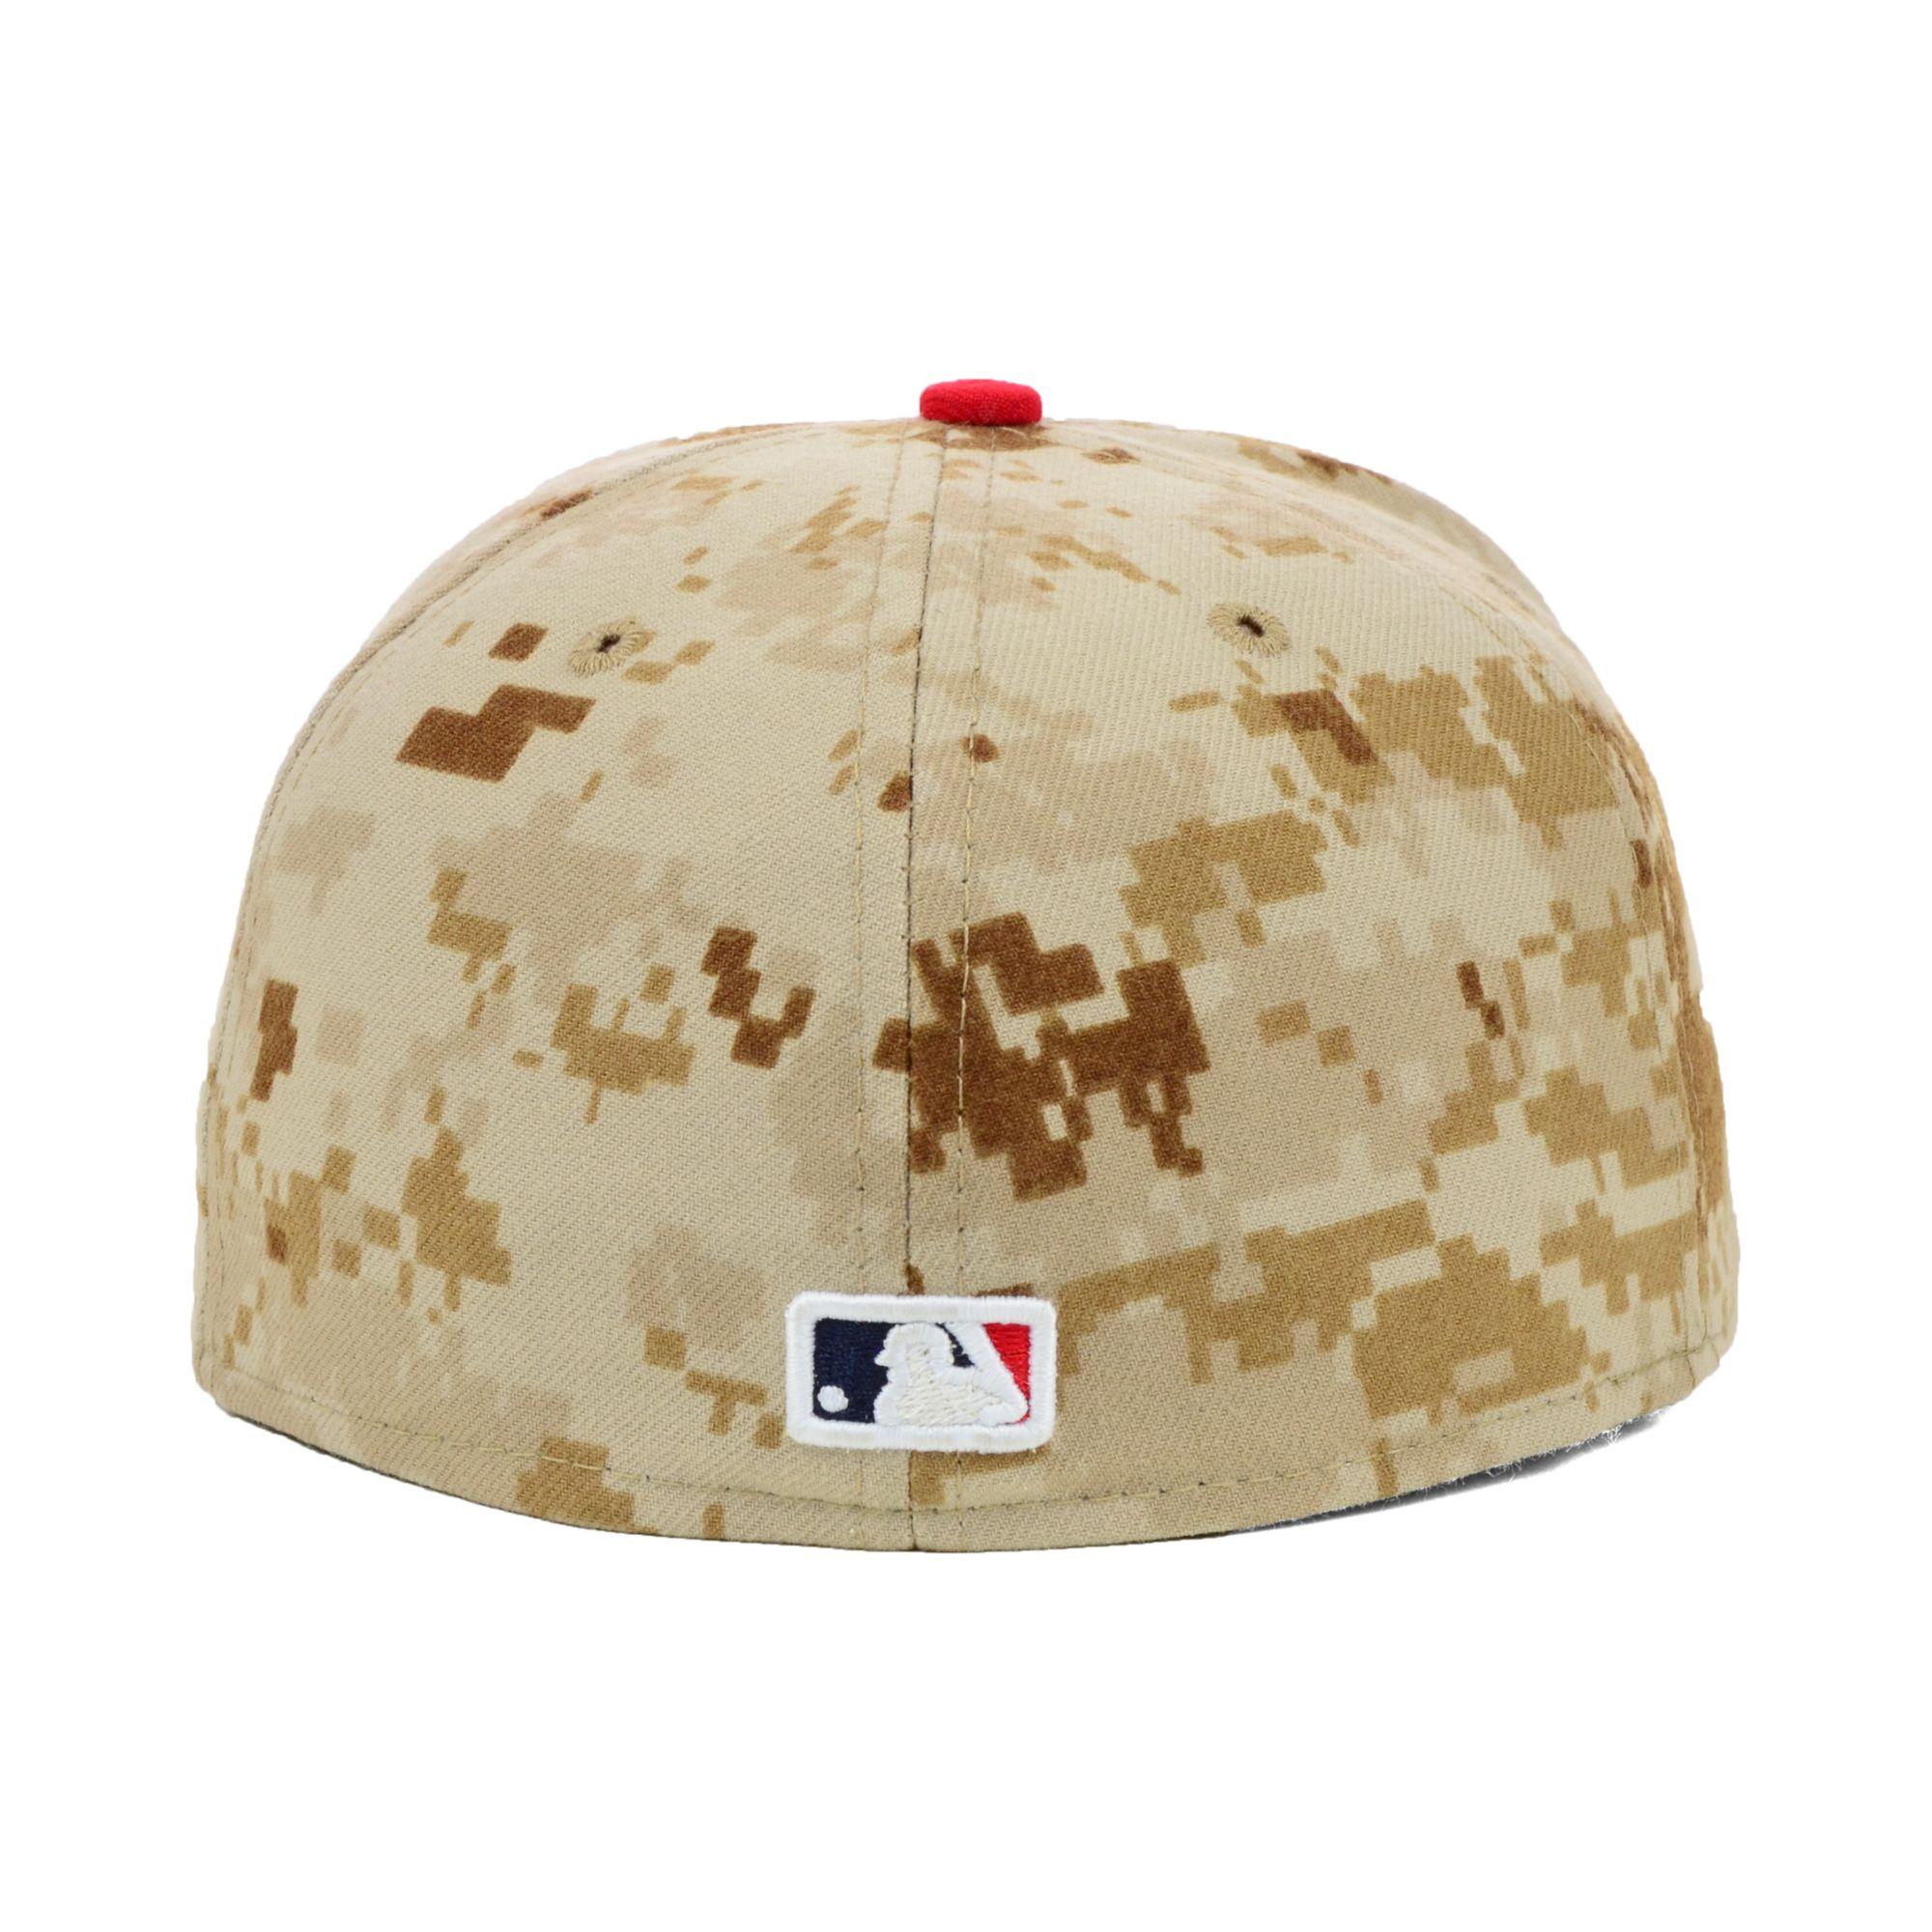 Lyst - KTZ Atlanta Braves Stars and Stripes 59fifty Cap in Natural ... 3aaf6fbd4f24